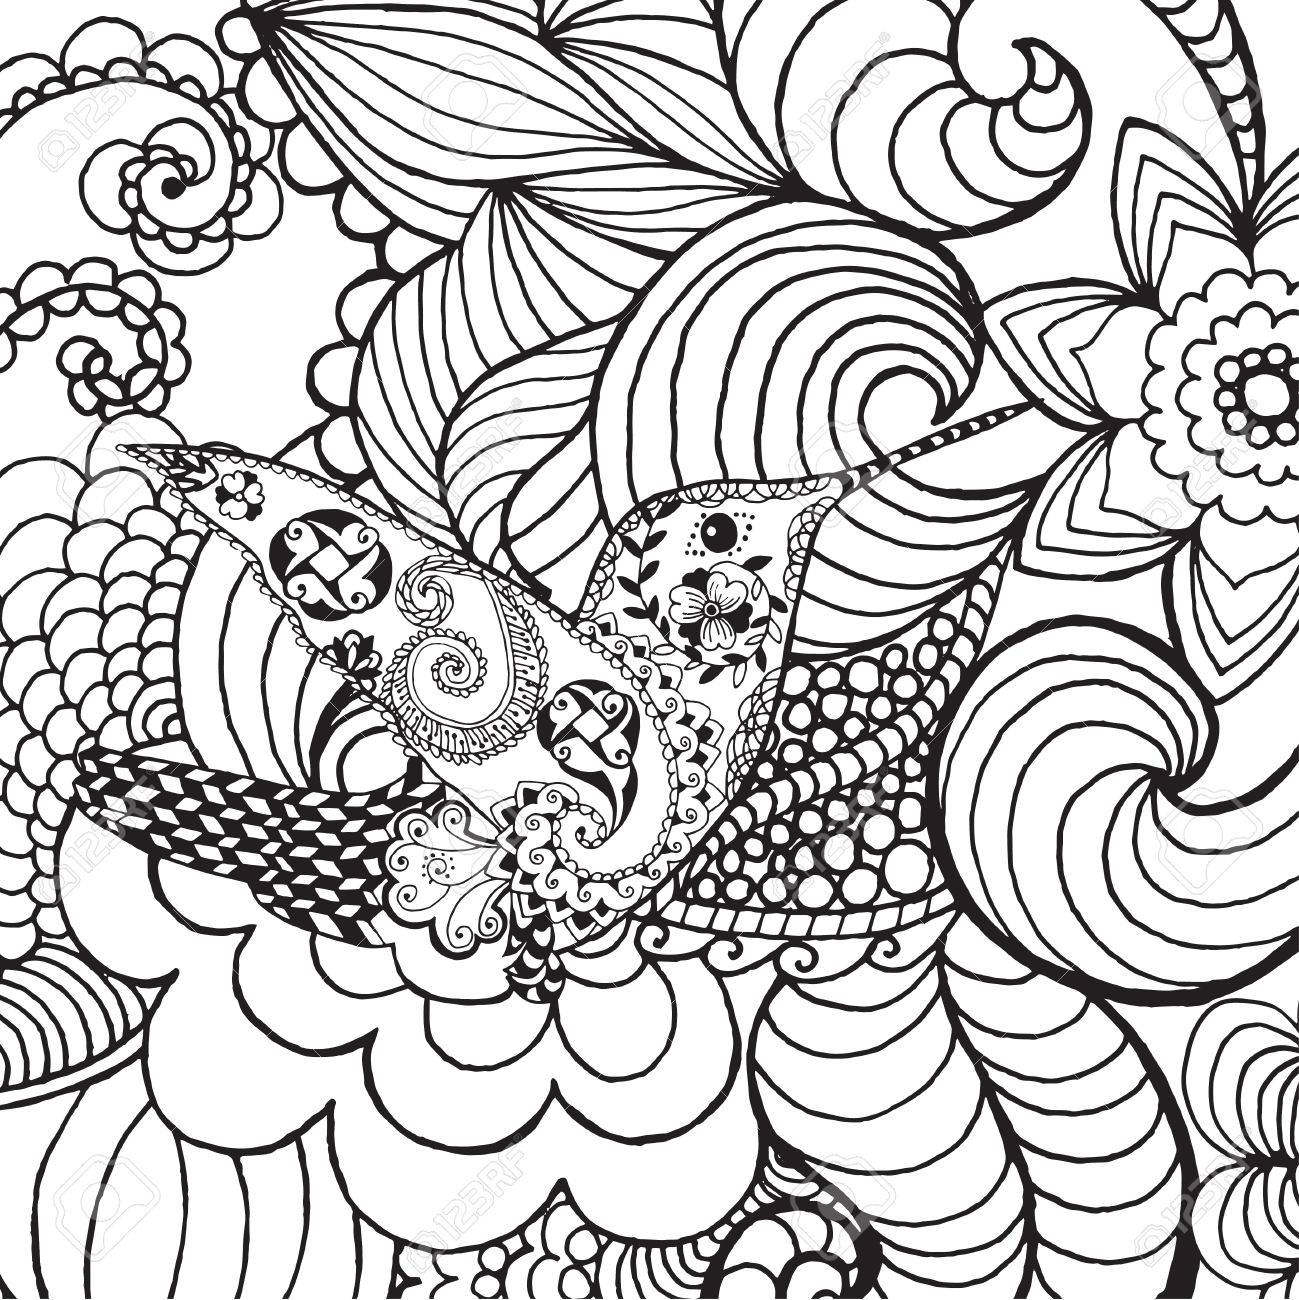 1299x1300 Hummingbird In Fantasy Garden. Animals. Hand Drawn Doodle. Ethnic